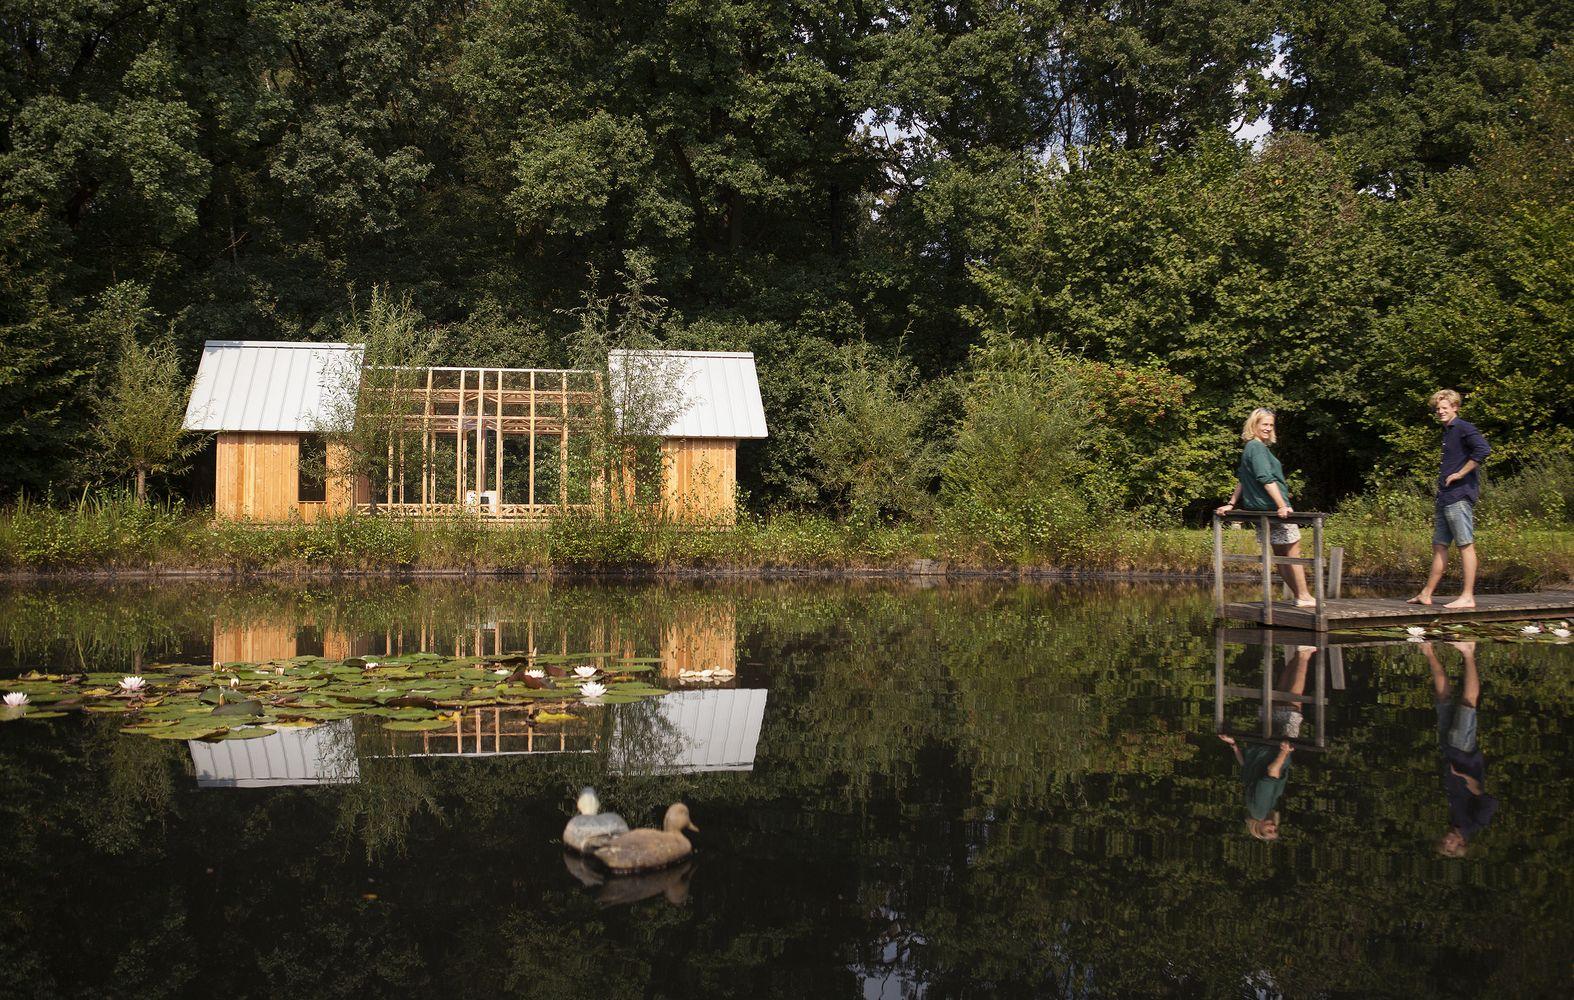 Gallery of Garden House / Caspar Schols - 18